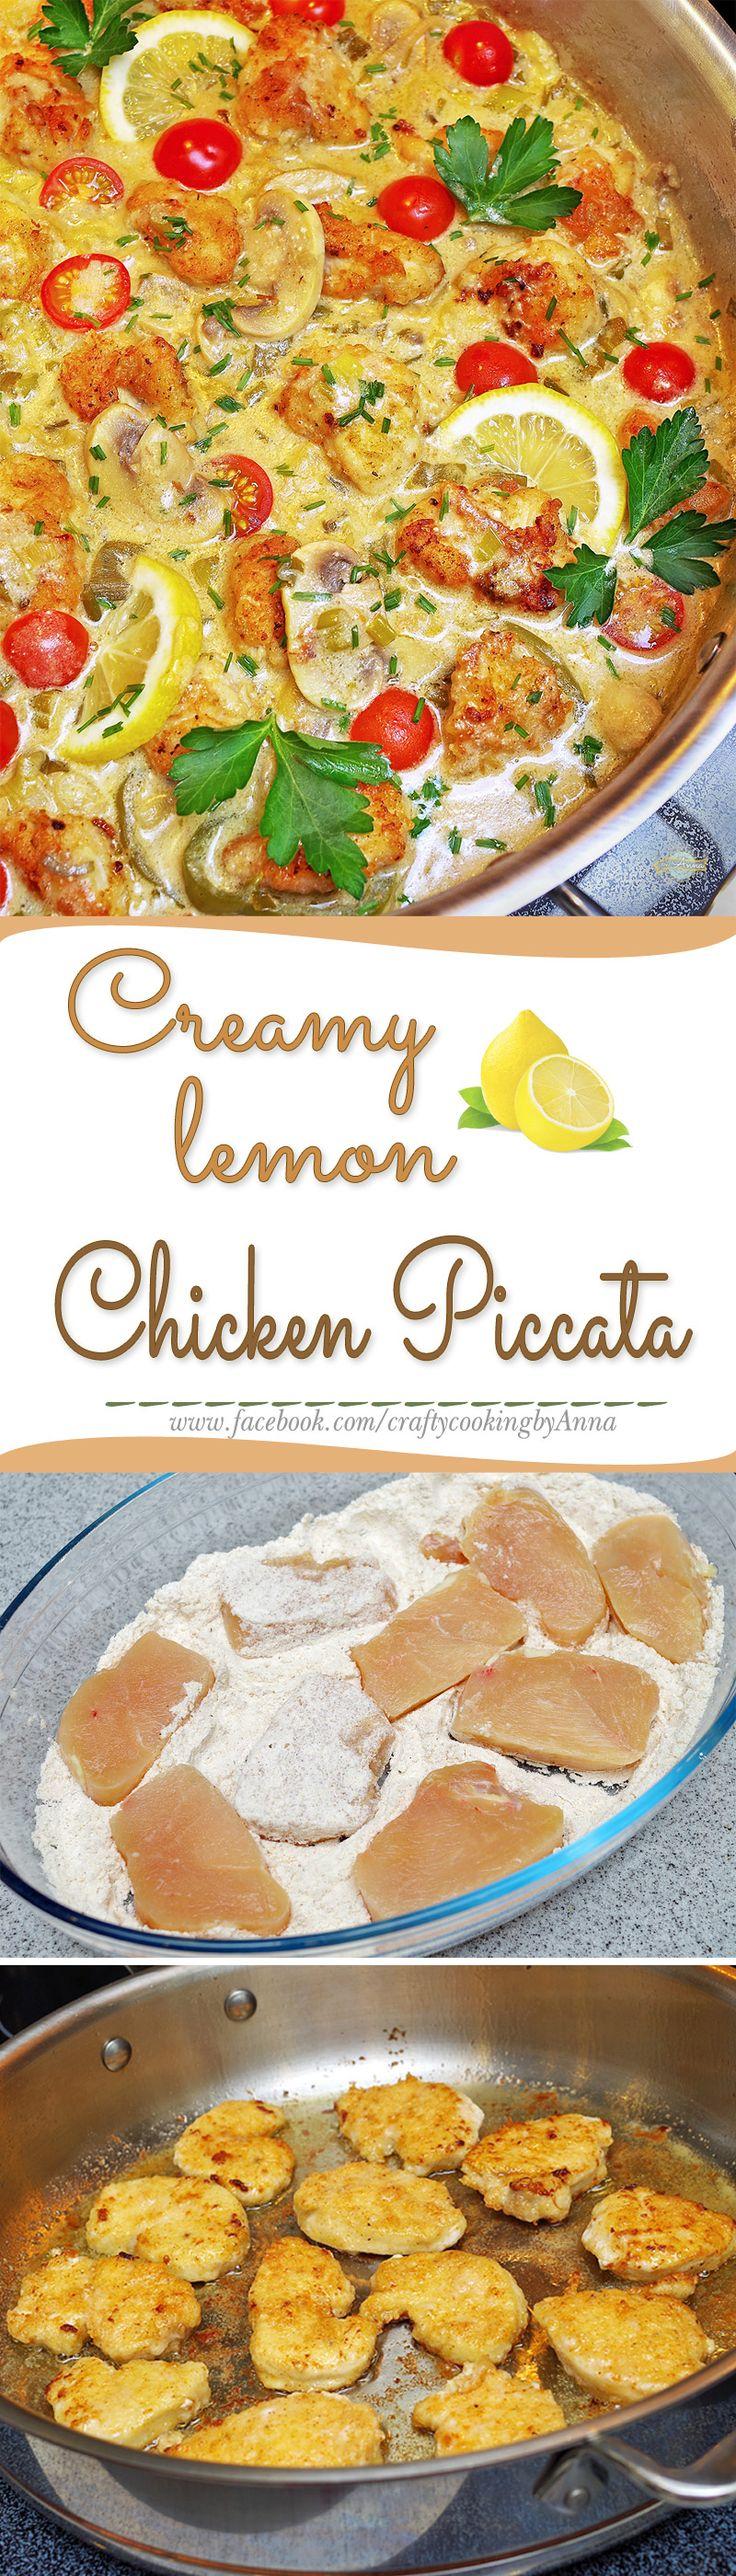 CREAMY Lemon Chicken Piccata!#Easy #Delicious#Everyday #Beautiful #Homecooking…